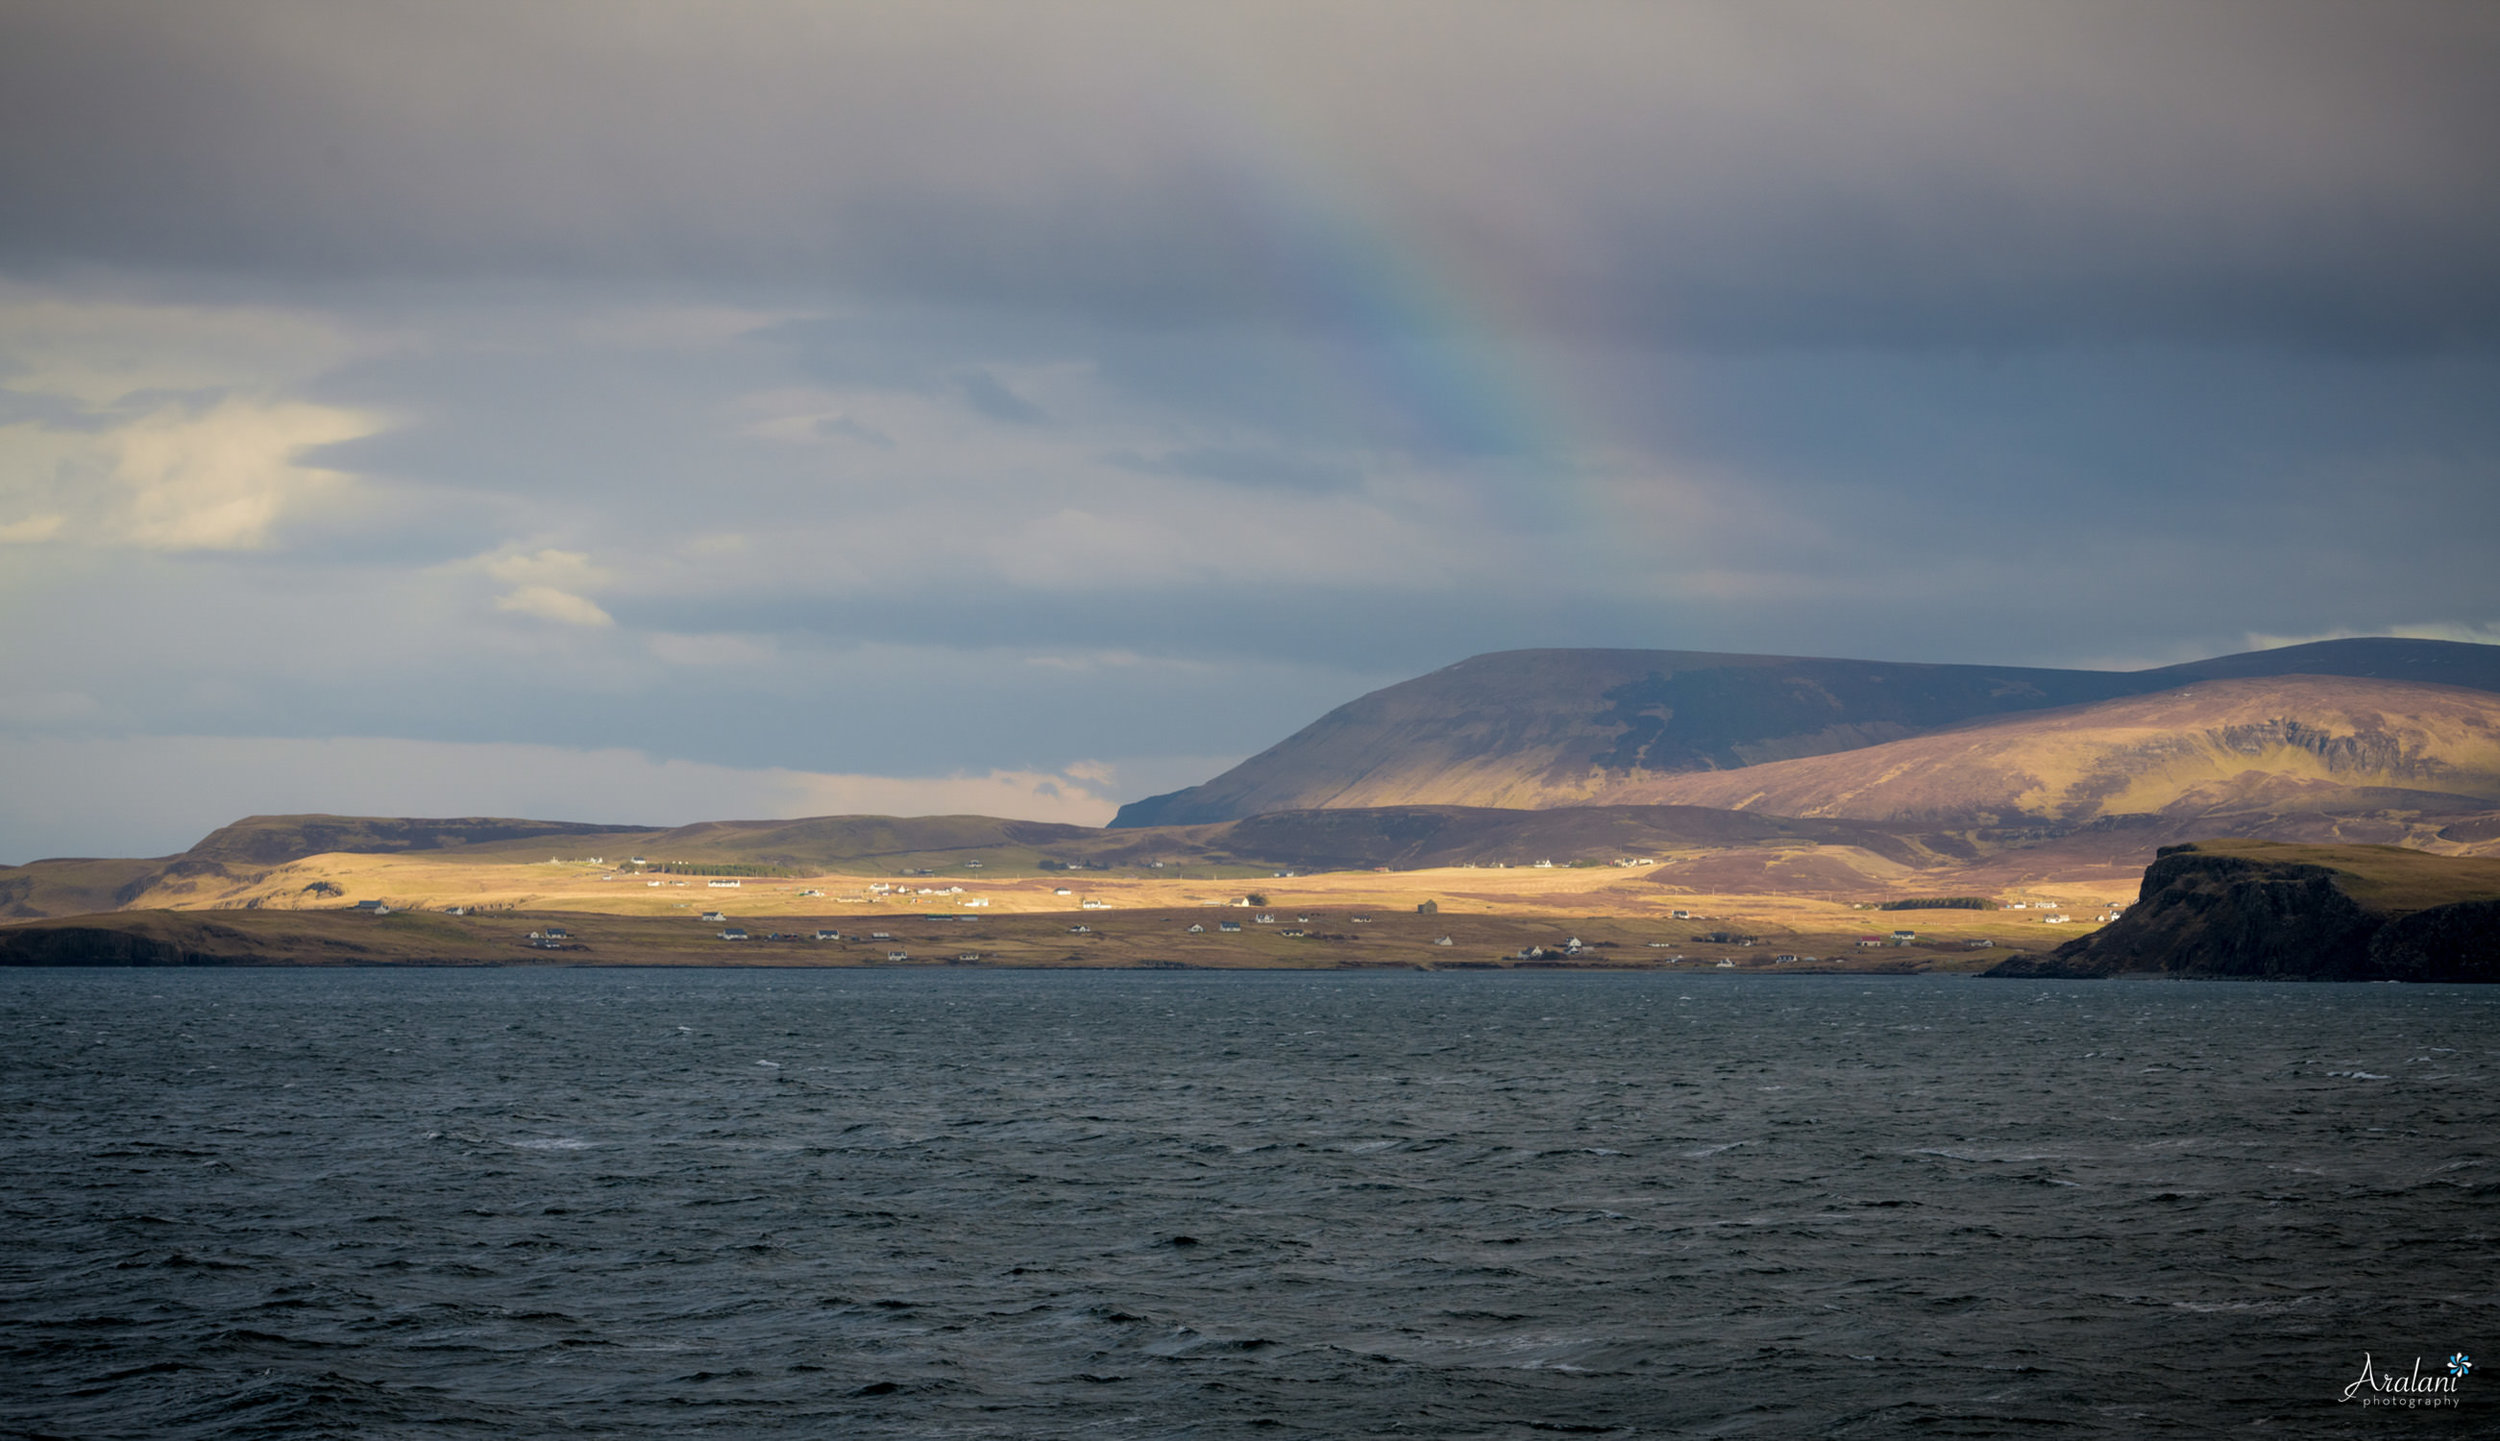 Aralani_Scotland_0039.jpg